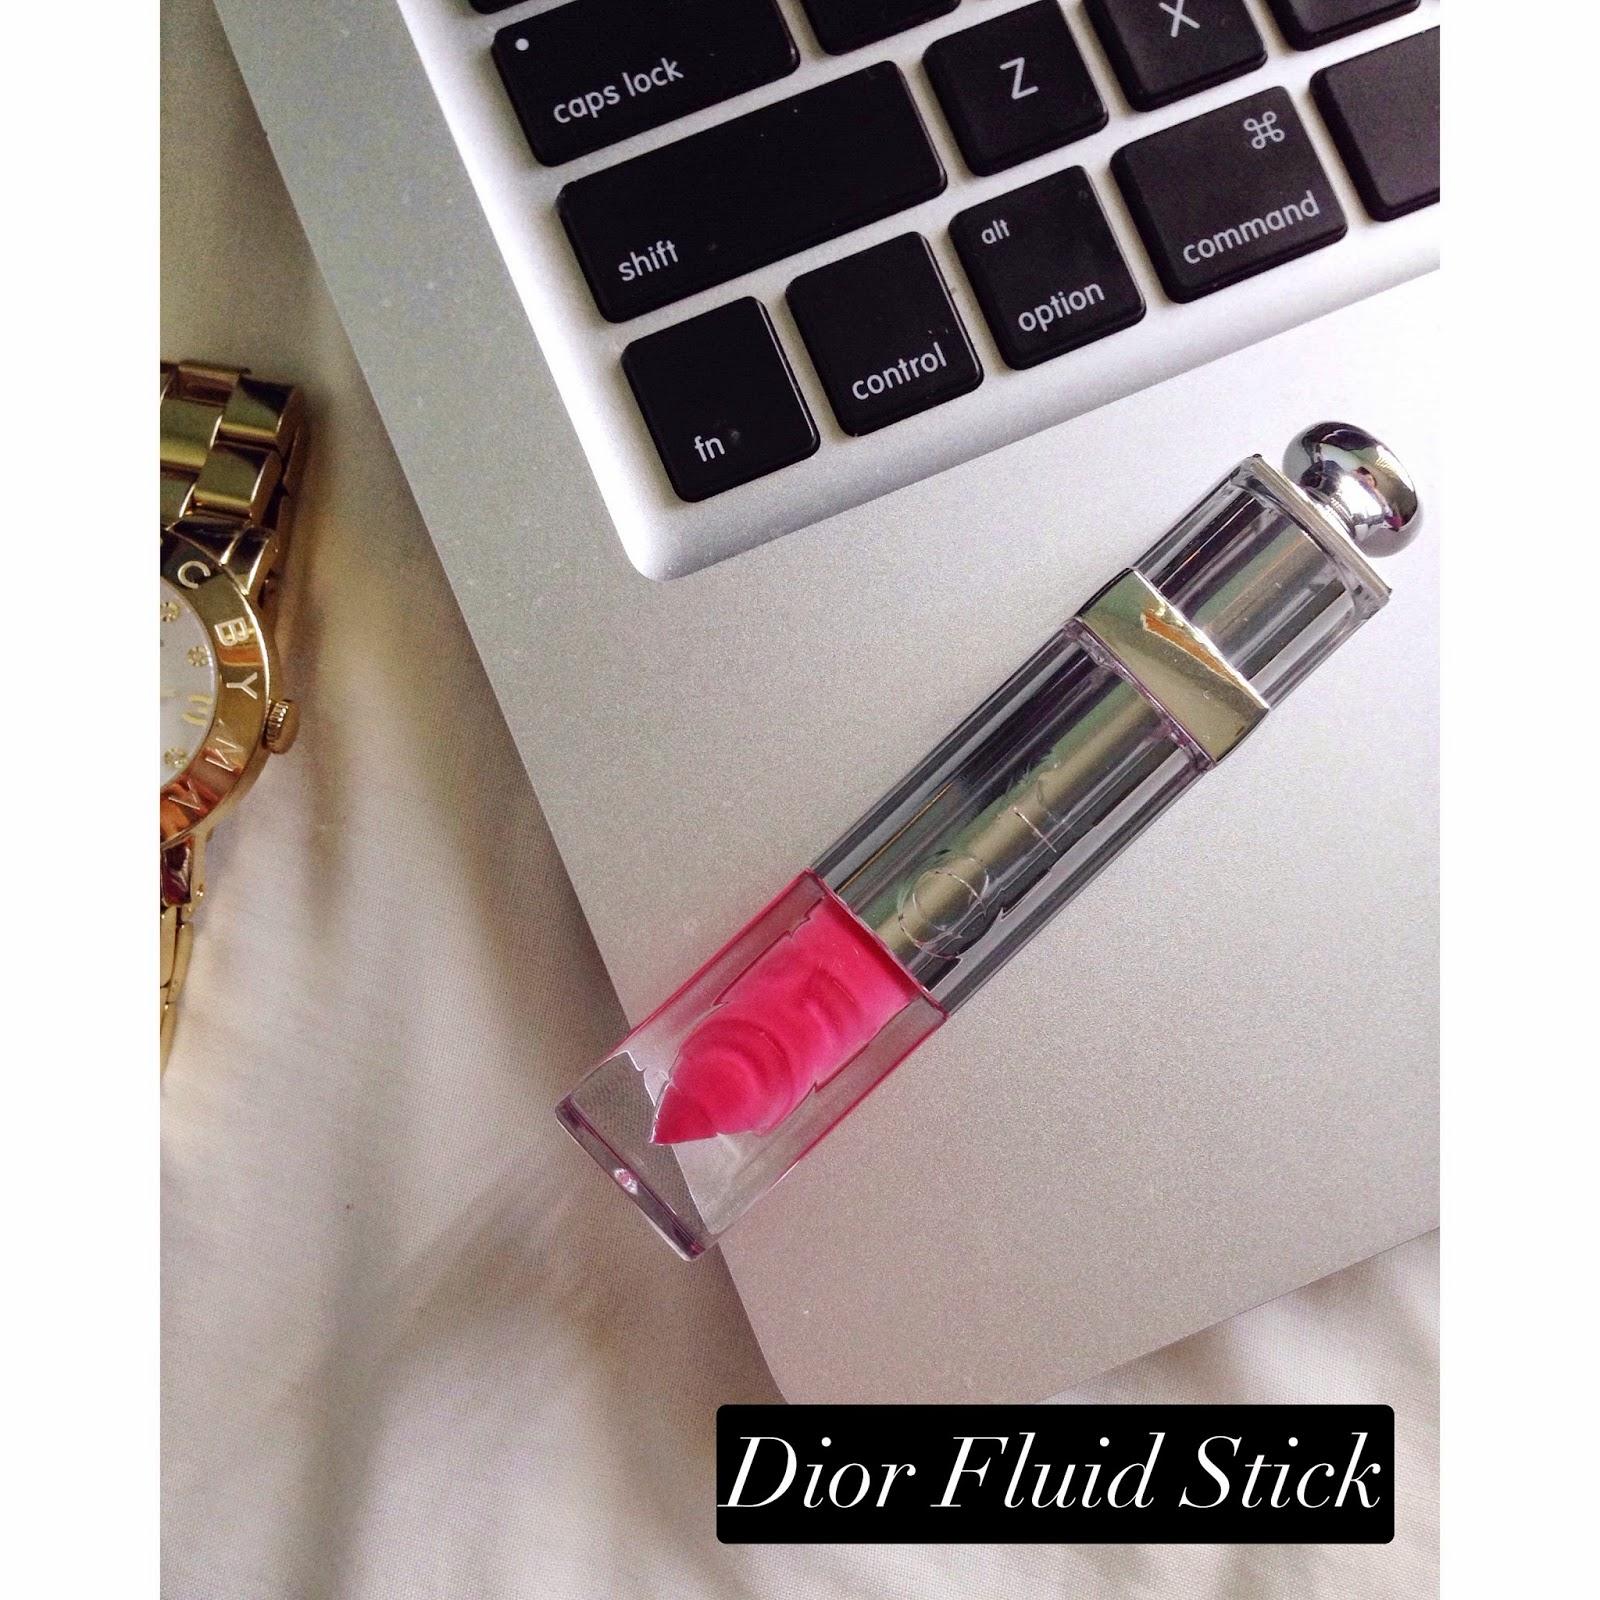 Review Dior Fluid Stick Beauty Makeup